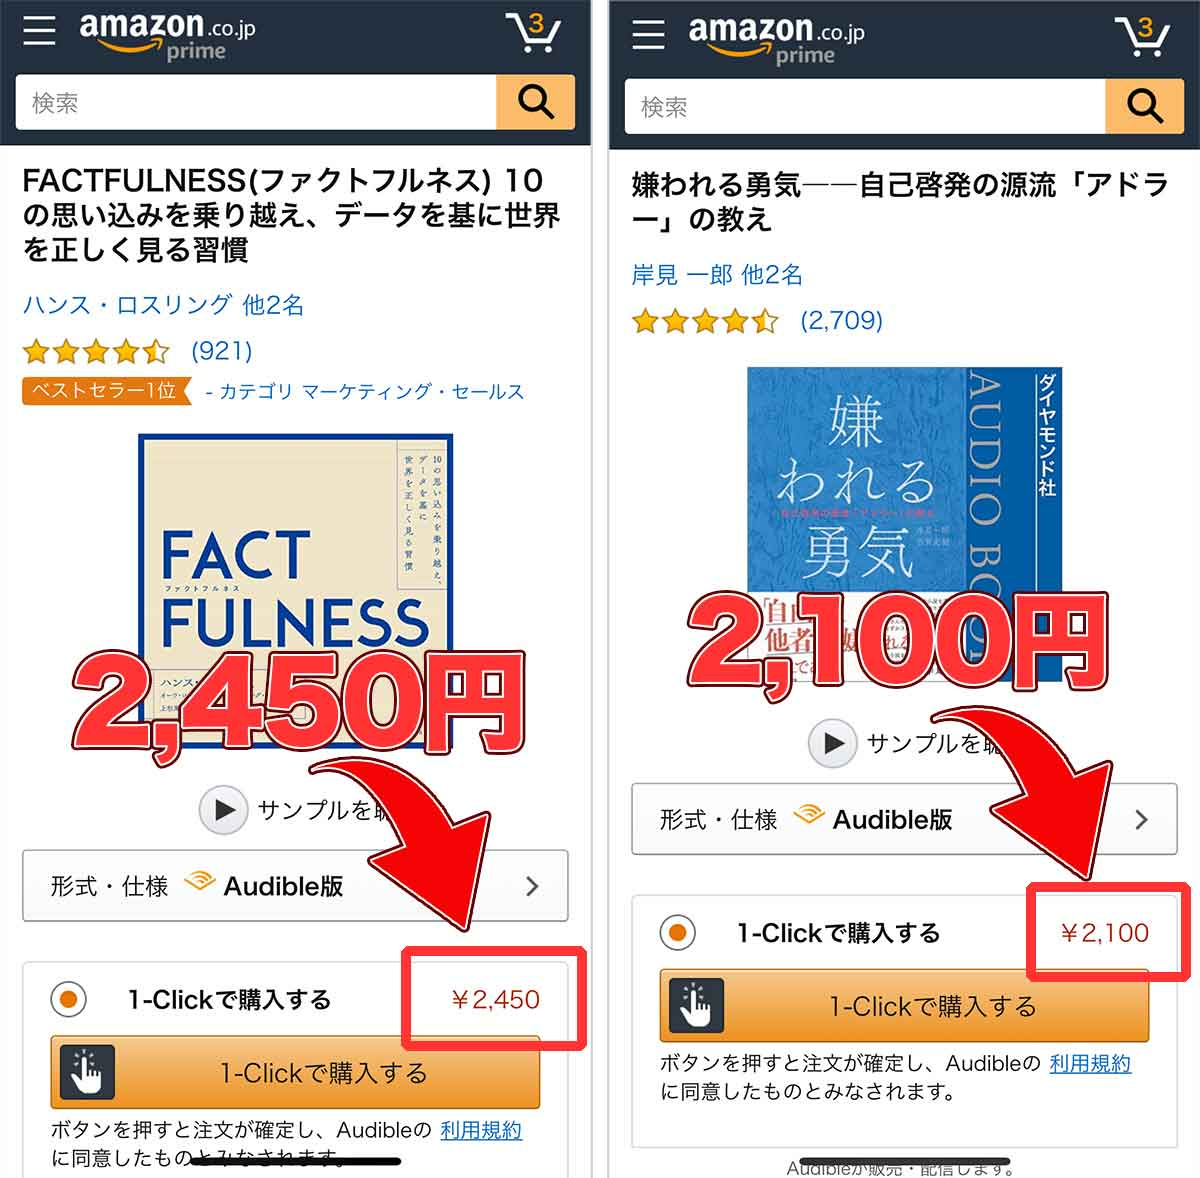 Amazonのオーディオブックの価格